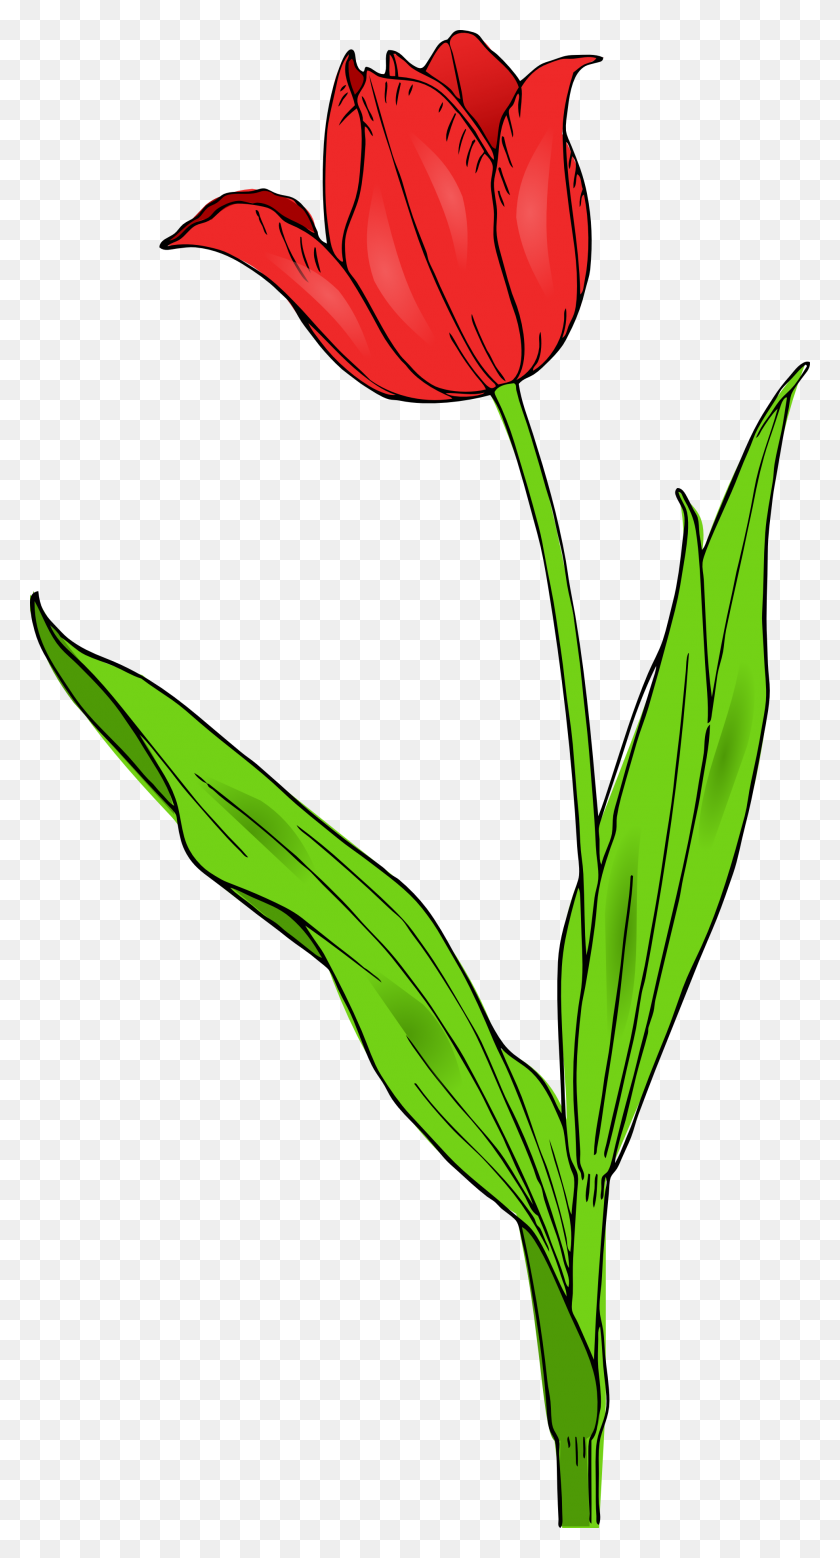 Free Tulip Clip Art Pictures - Flower Clipart